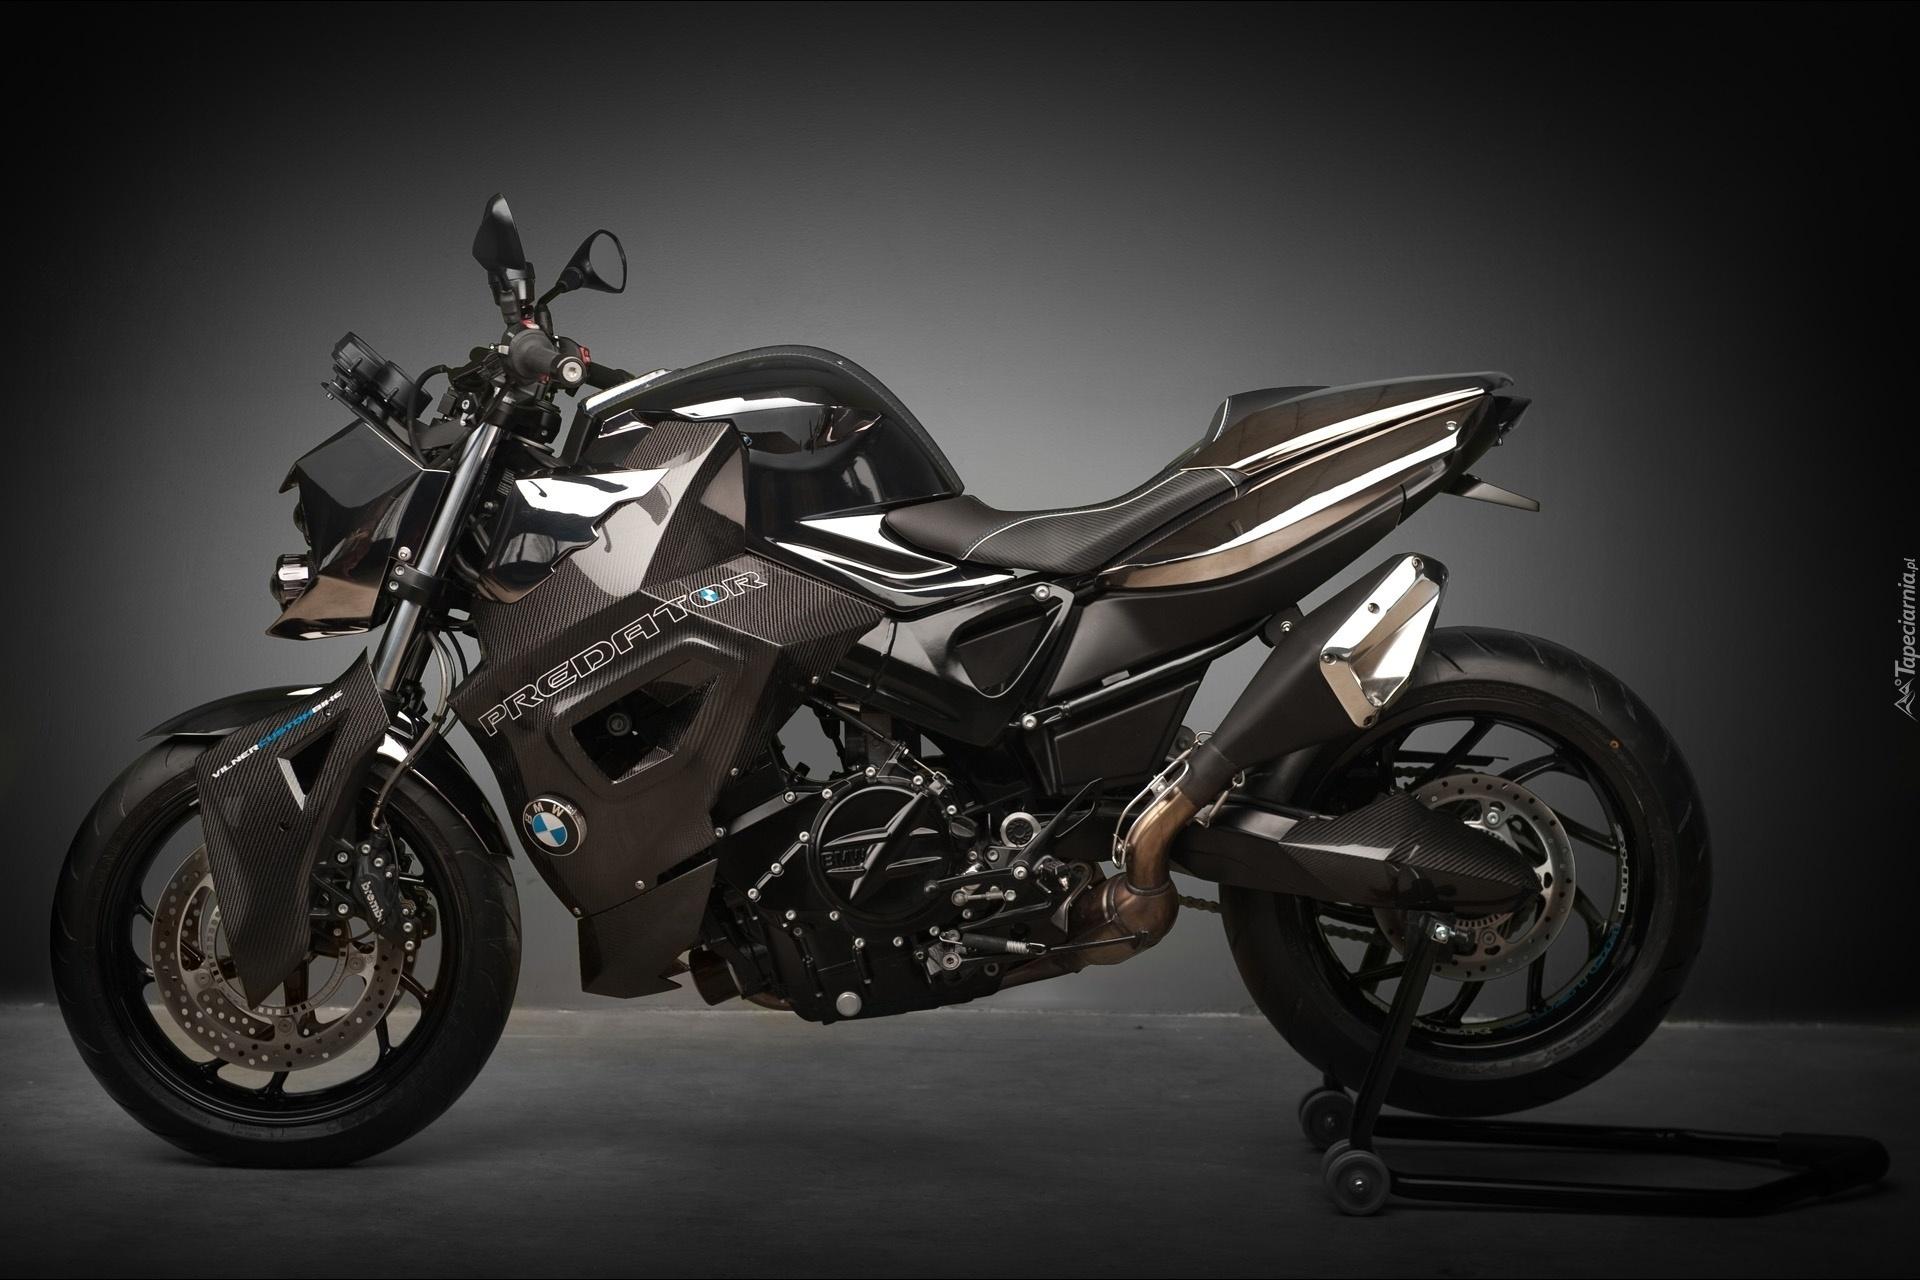 Motocykl Bmw Predator F800 R